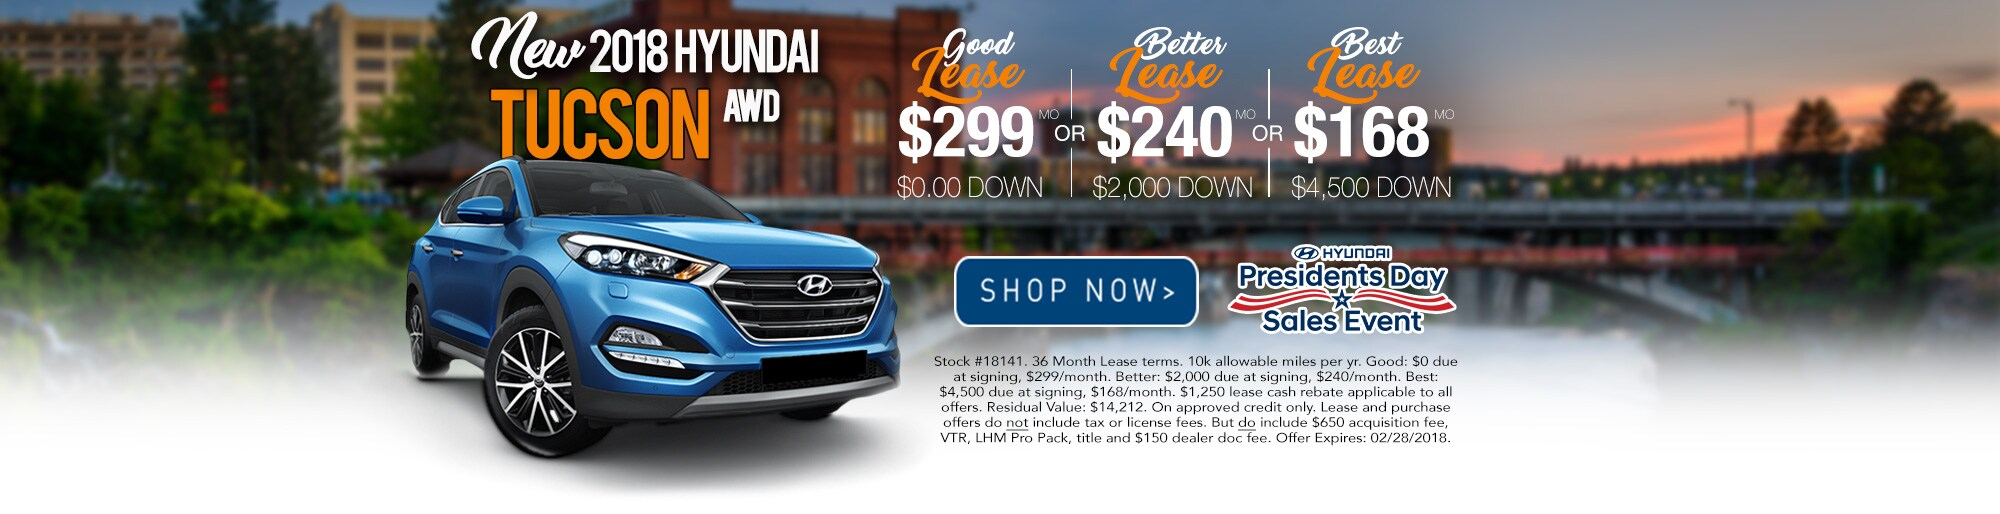 hyundai dealer spokane new used cars auto repair loans serving coeur d 39 alene id post. Black Bedroom Furniture Sets. Home Design Ideas